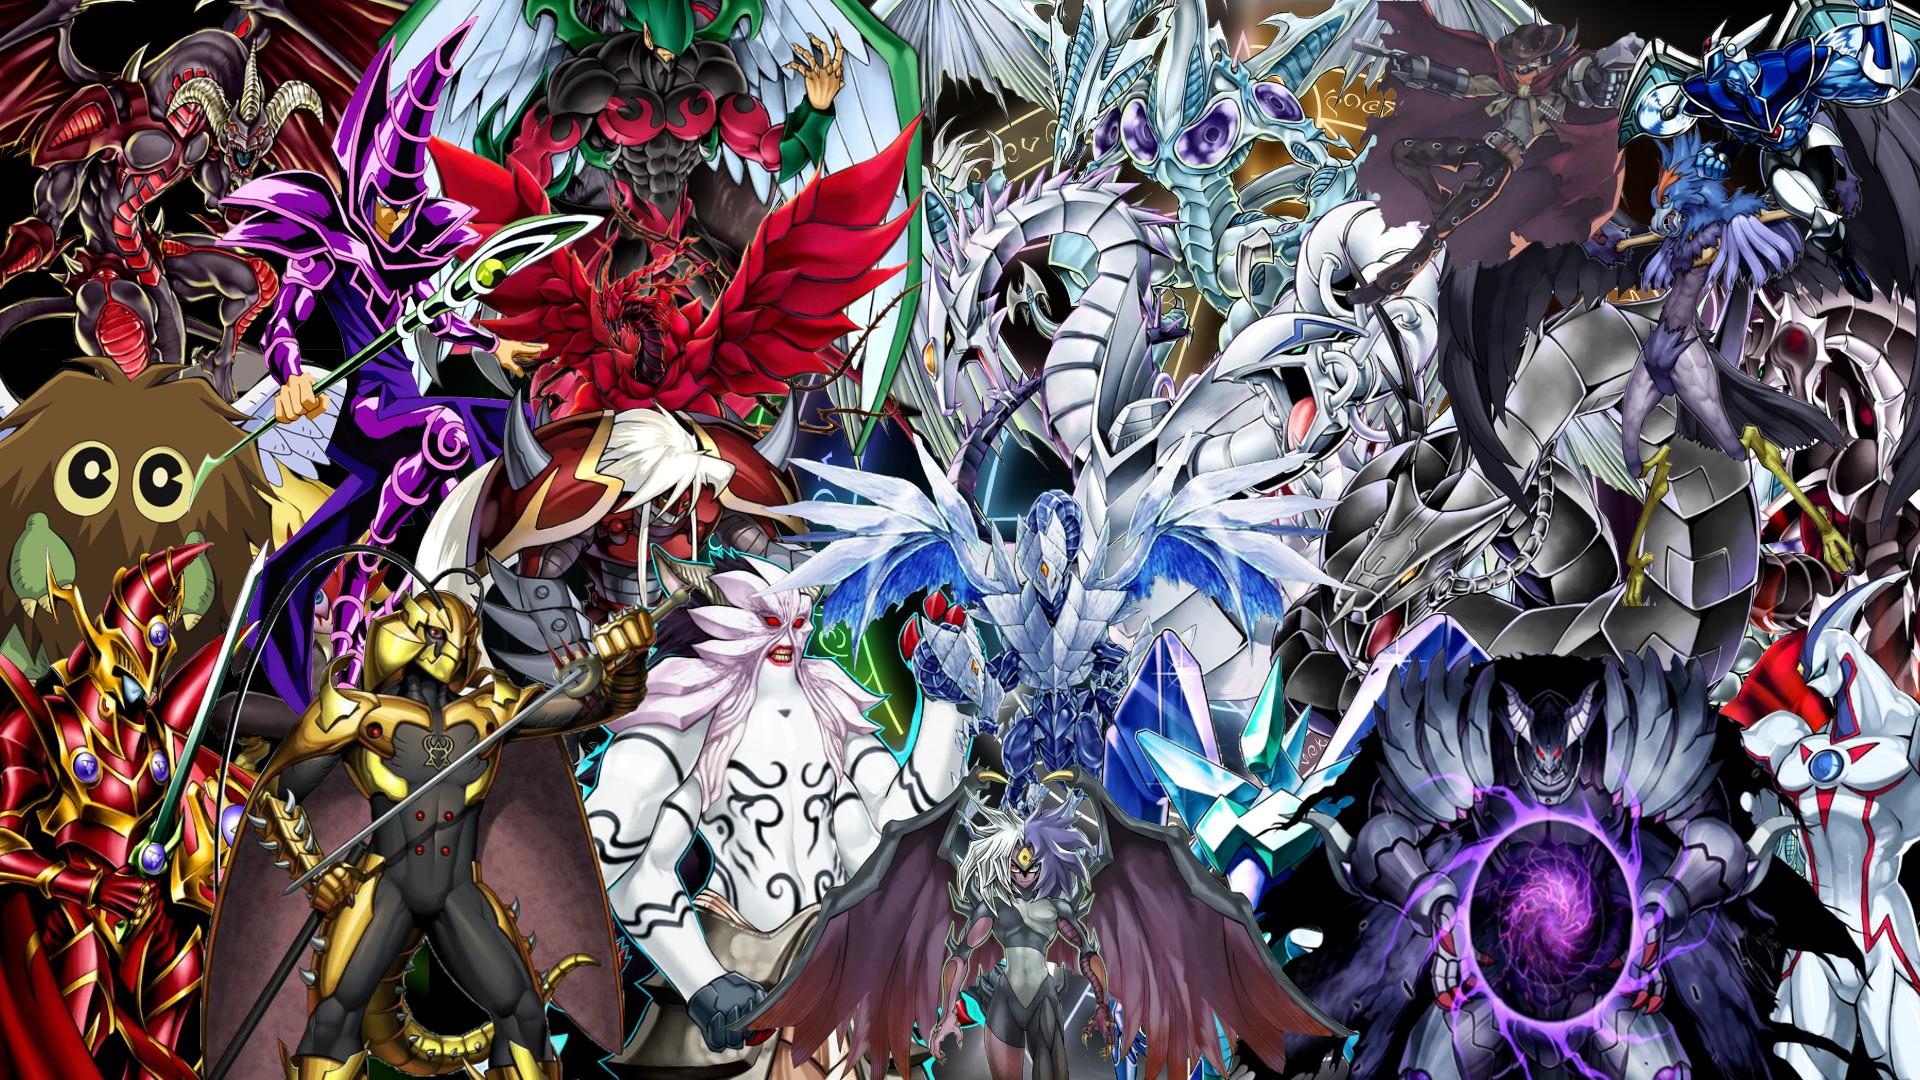 yugioh background ·① download free high resolution